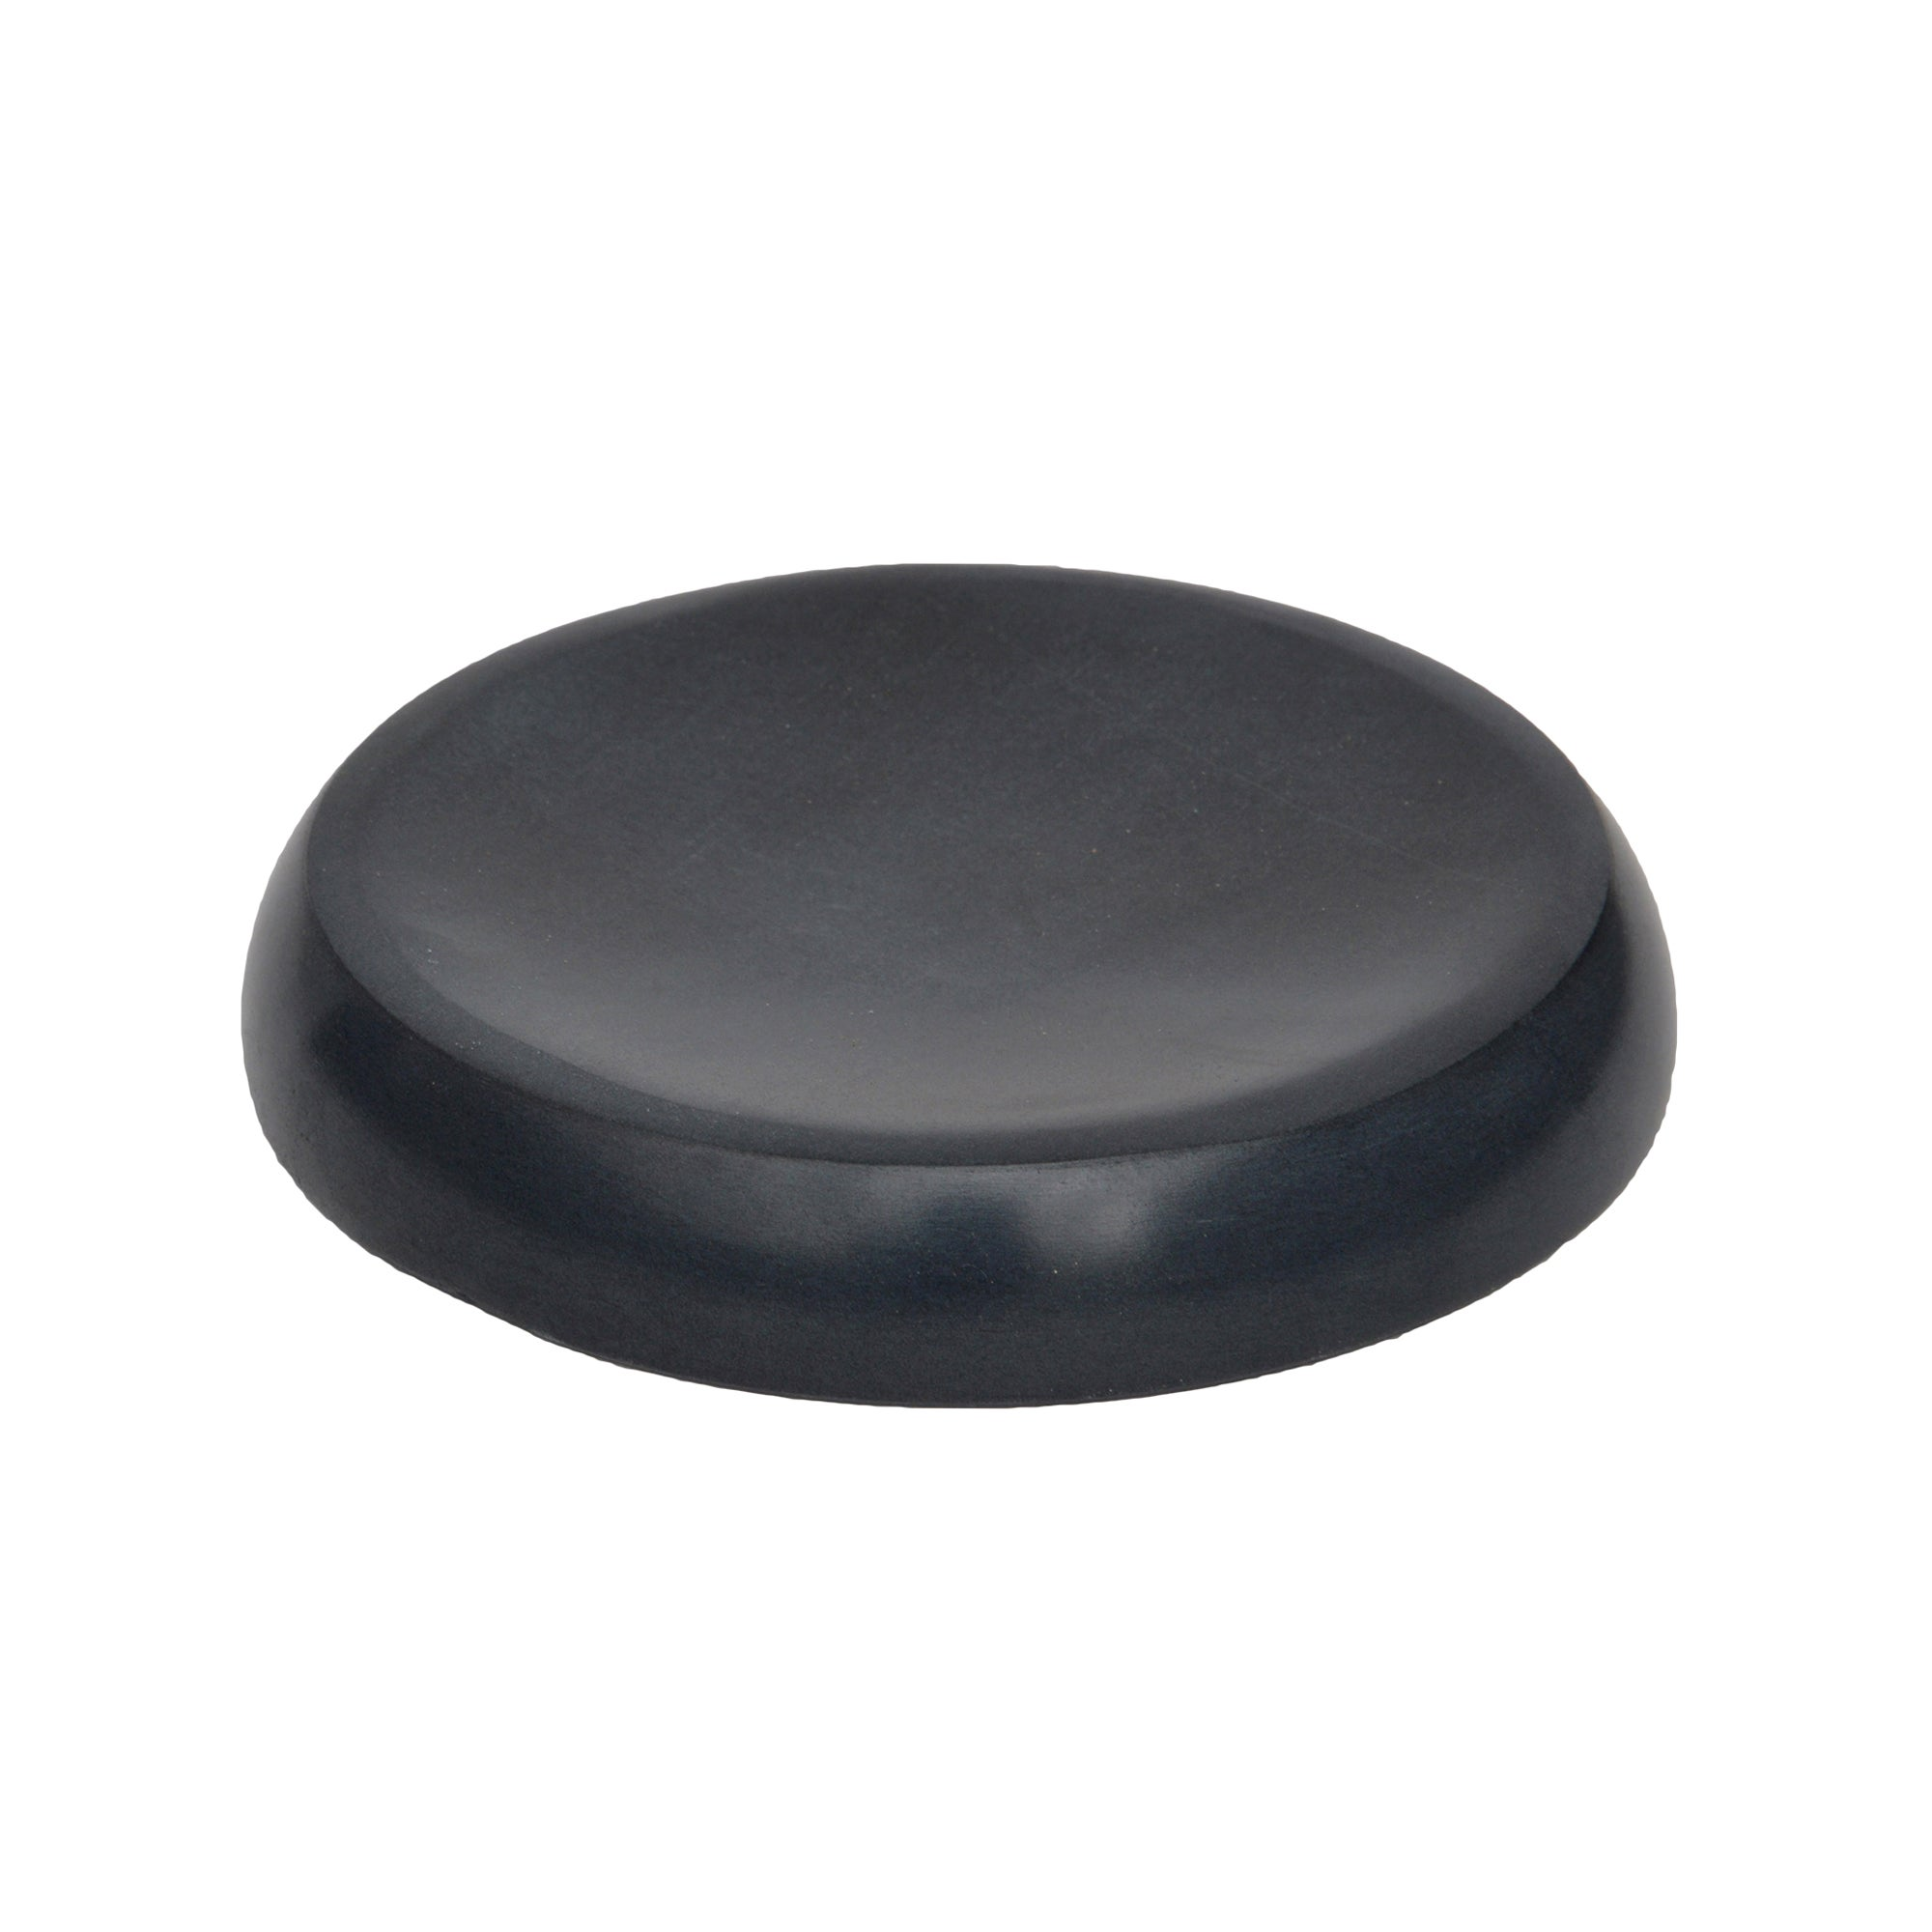 Hotel Soap Stone Soap Dish